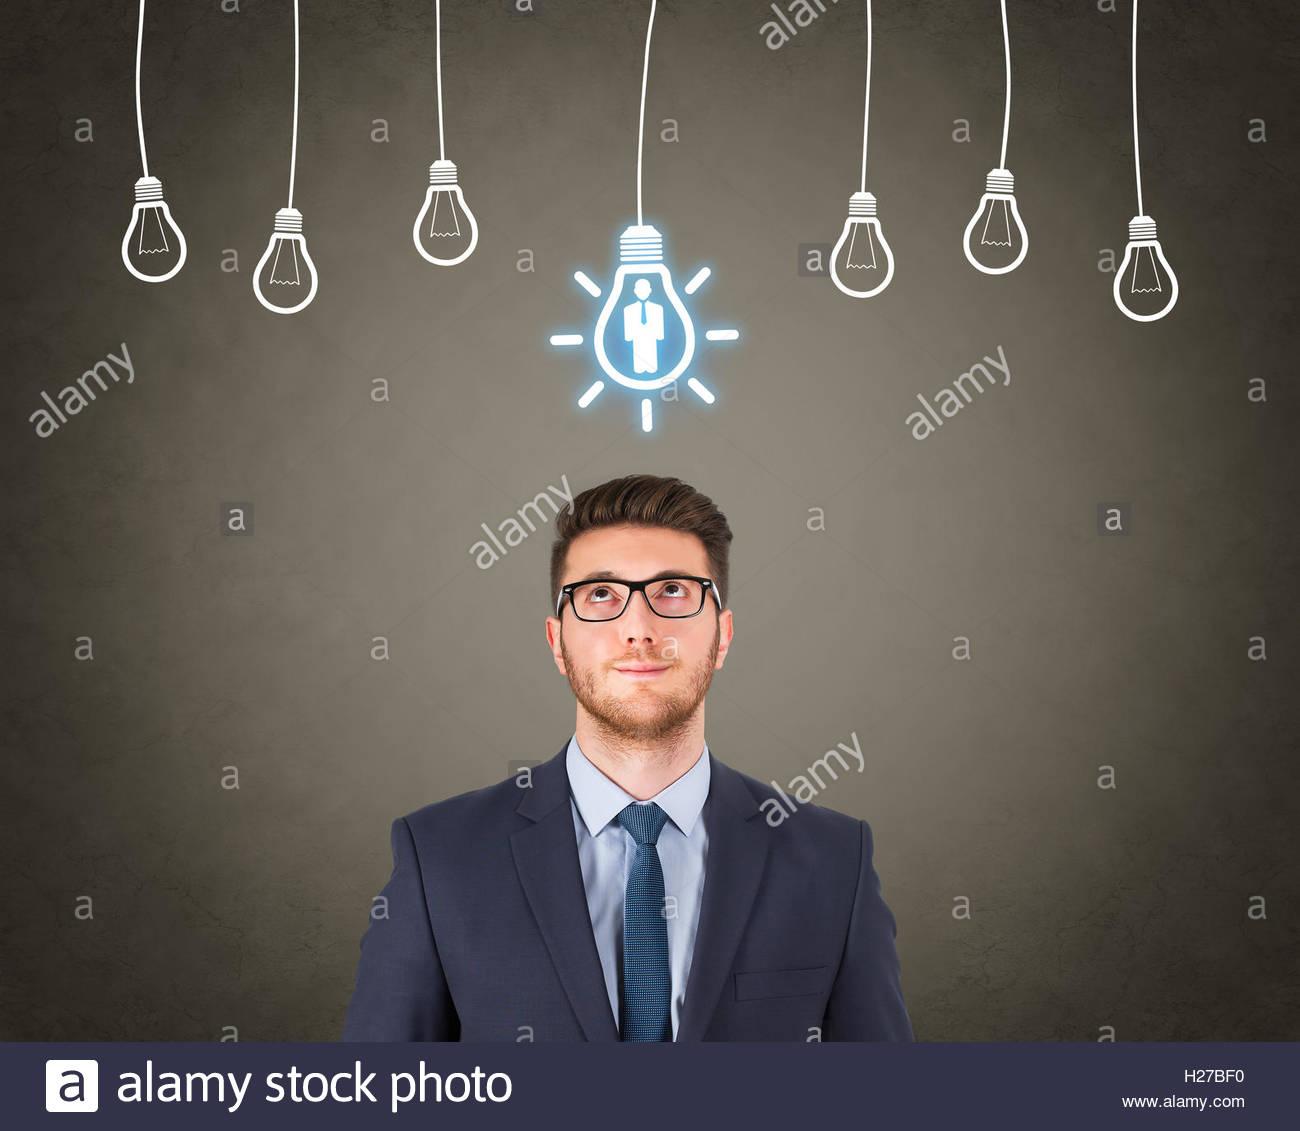 Brillante Idea de recursos humanos a lo largo de cabeza humana Imagen De Stock